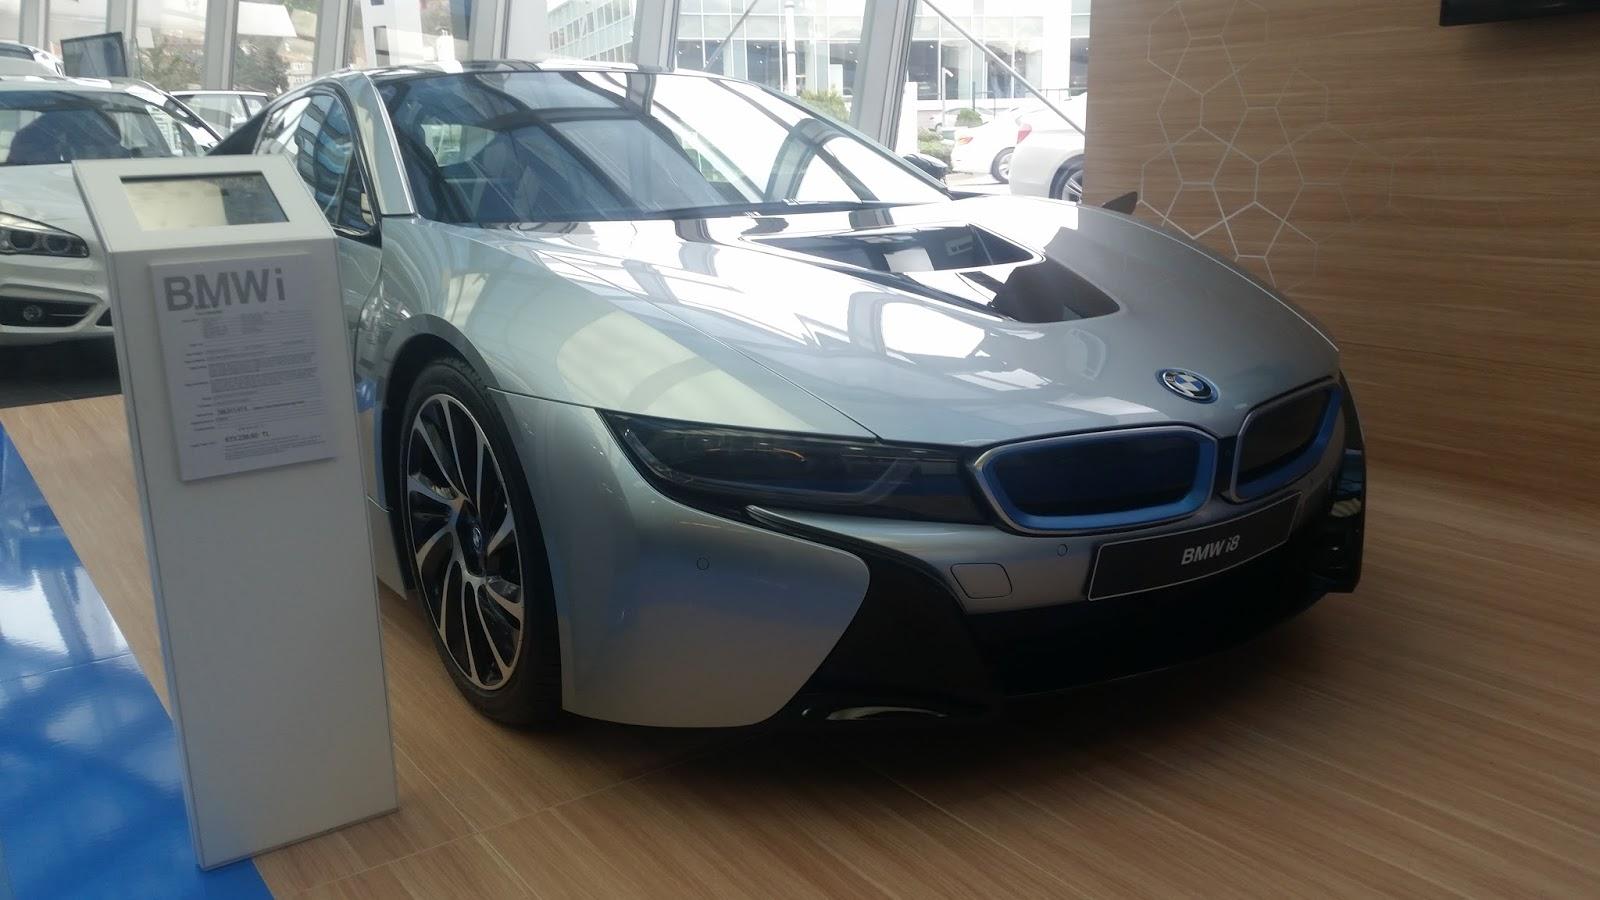 bmw i8 showroom İnceleme !!! | turgut alkim tutumlu car designer